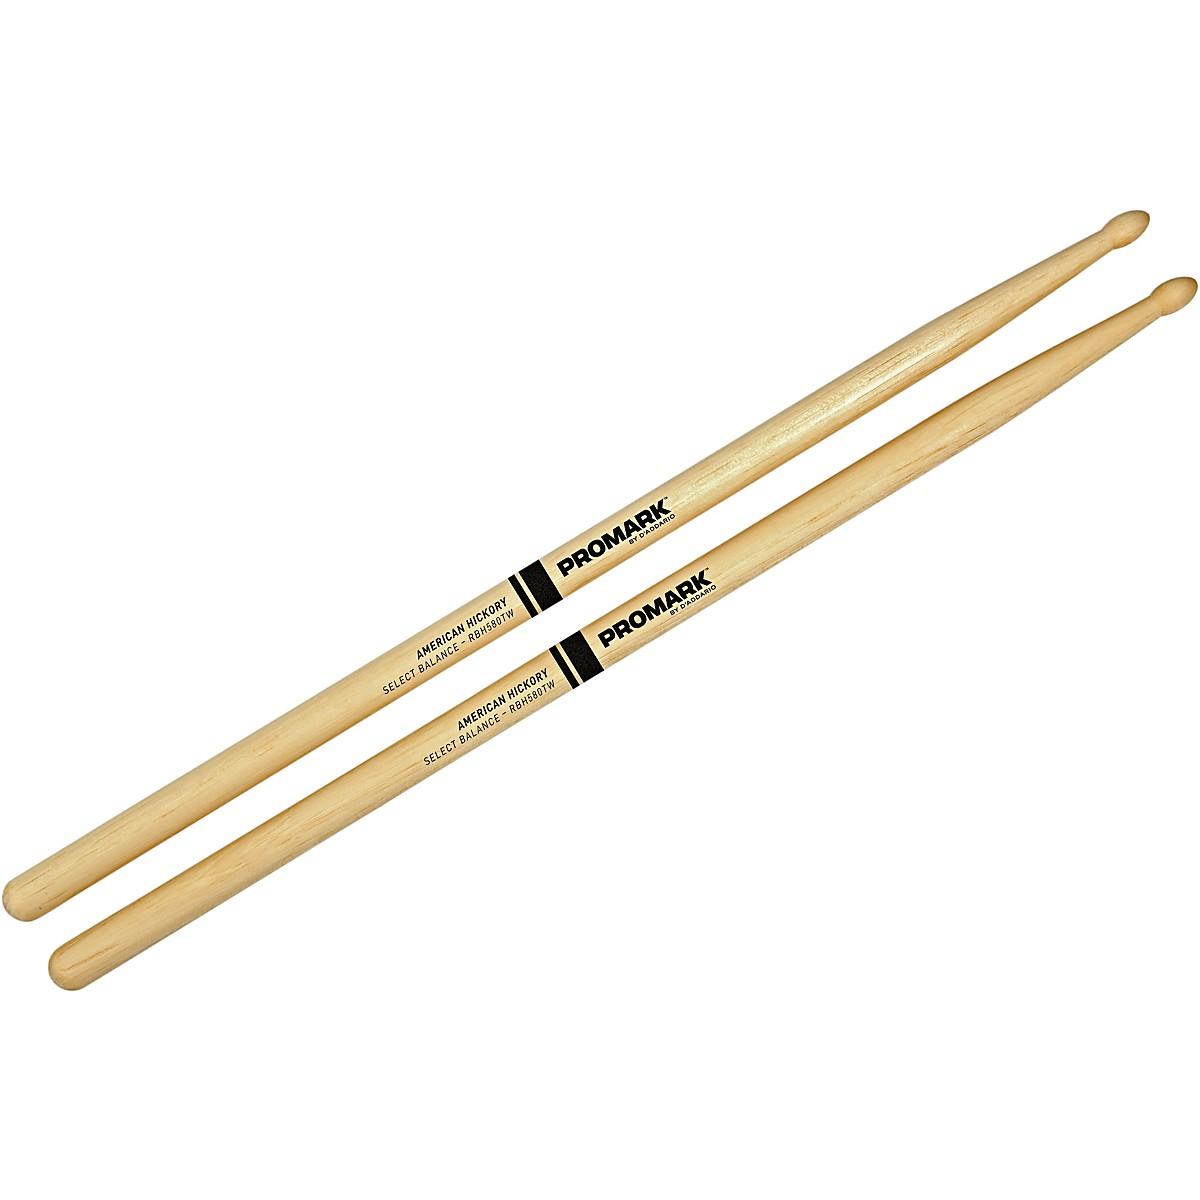 Promark Select Balance Rebound Balance Wood Tip Drumsticks